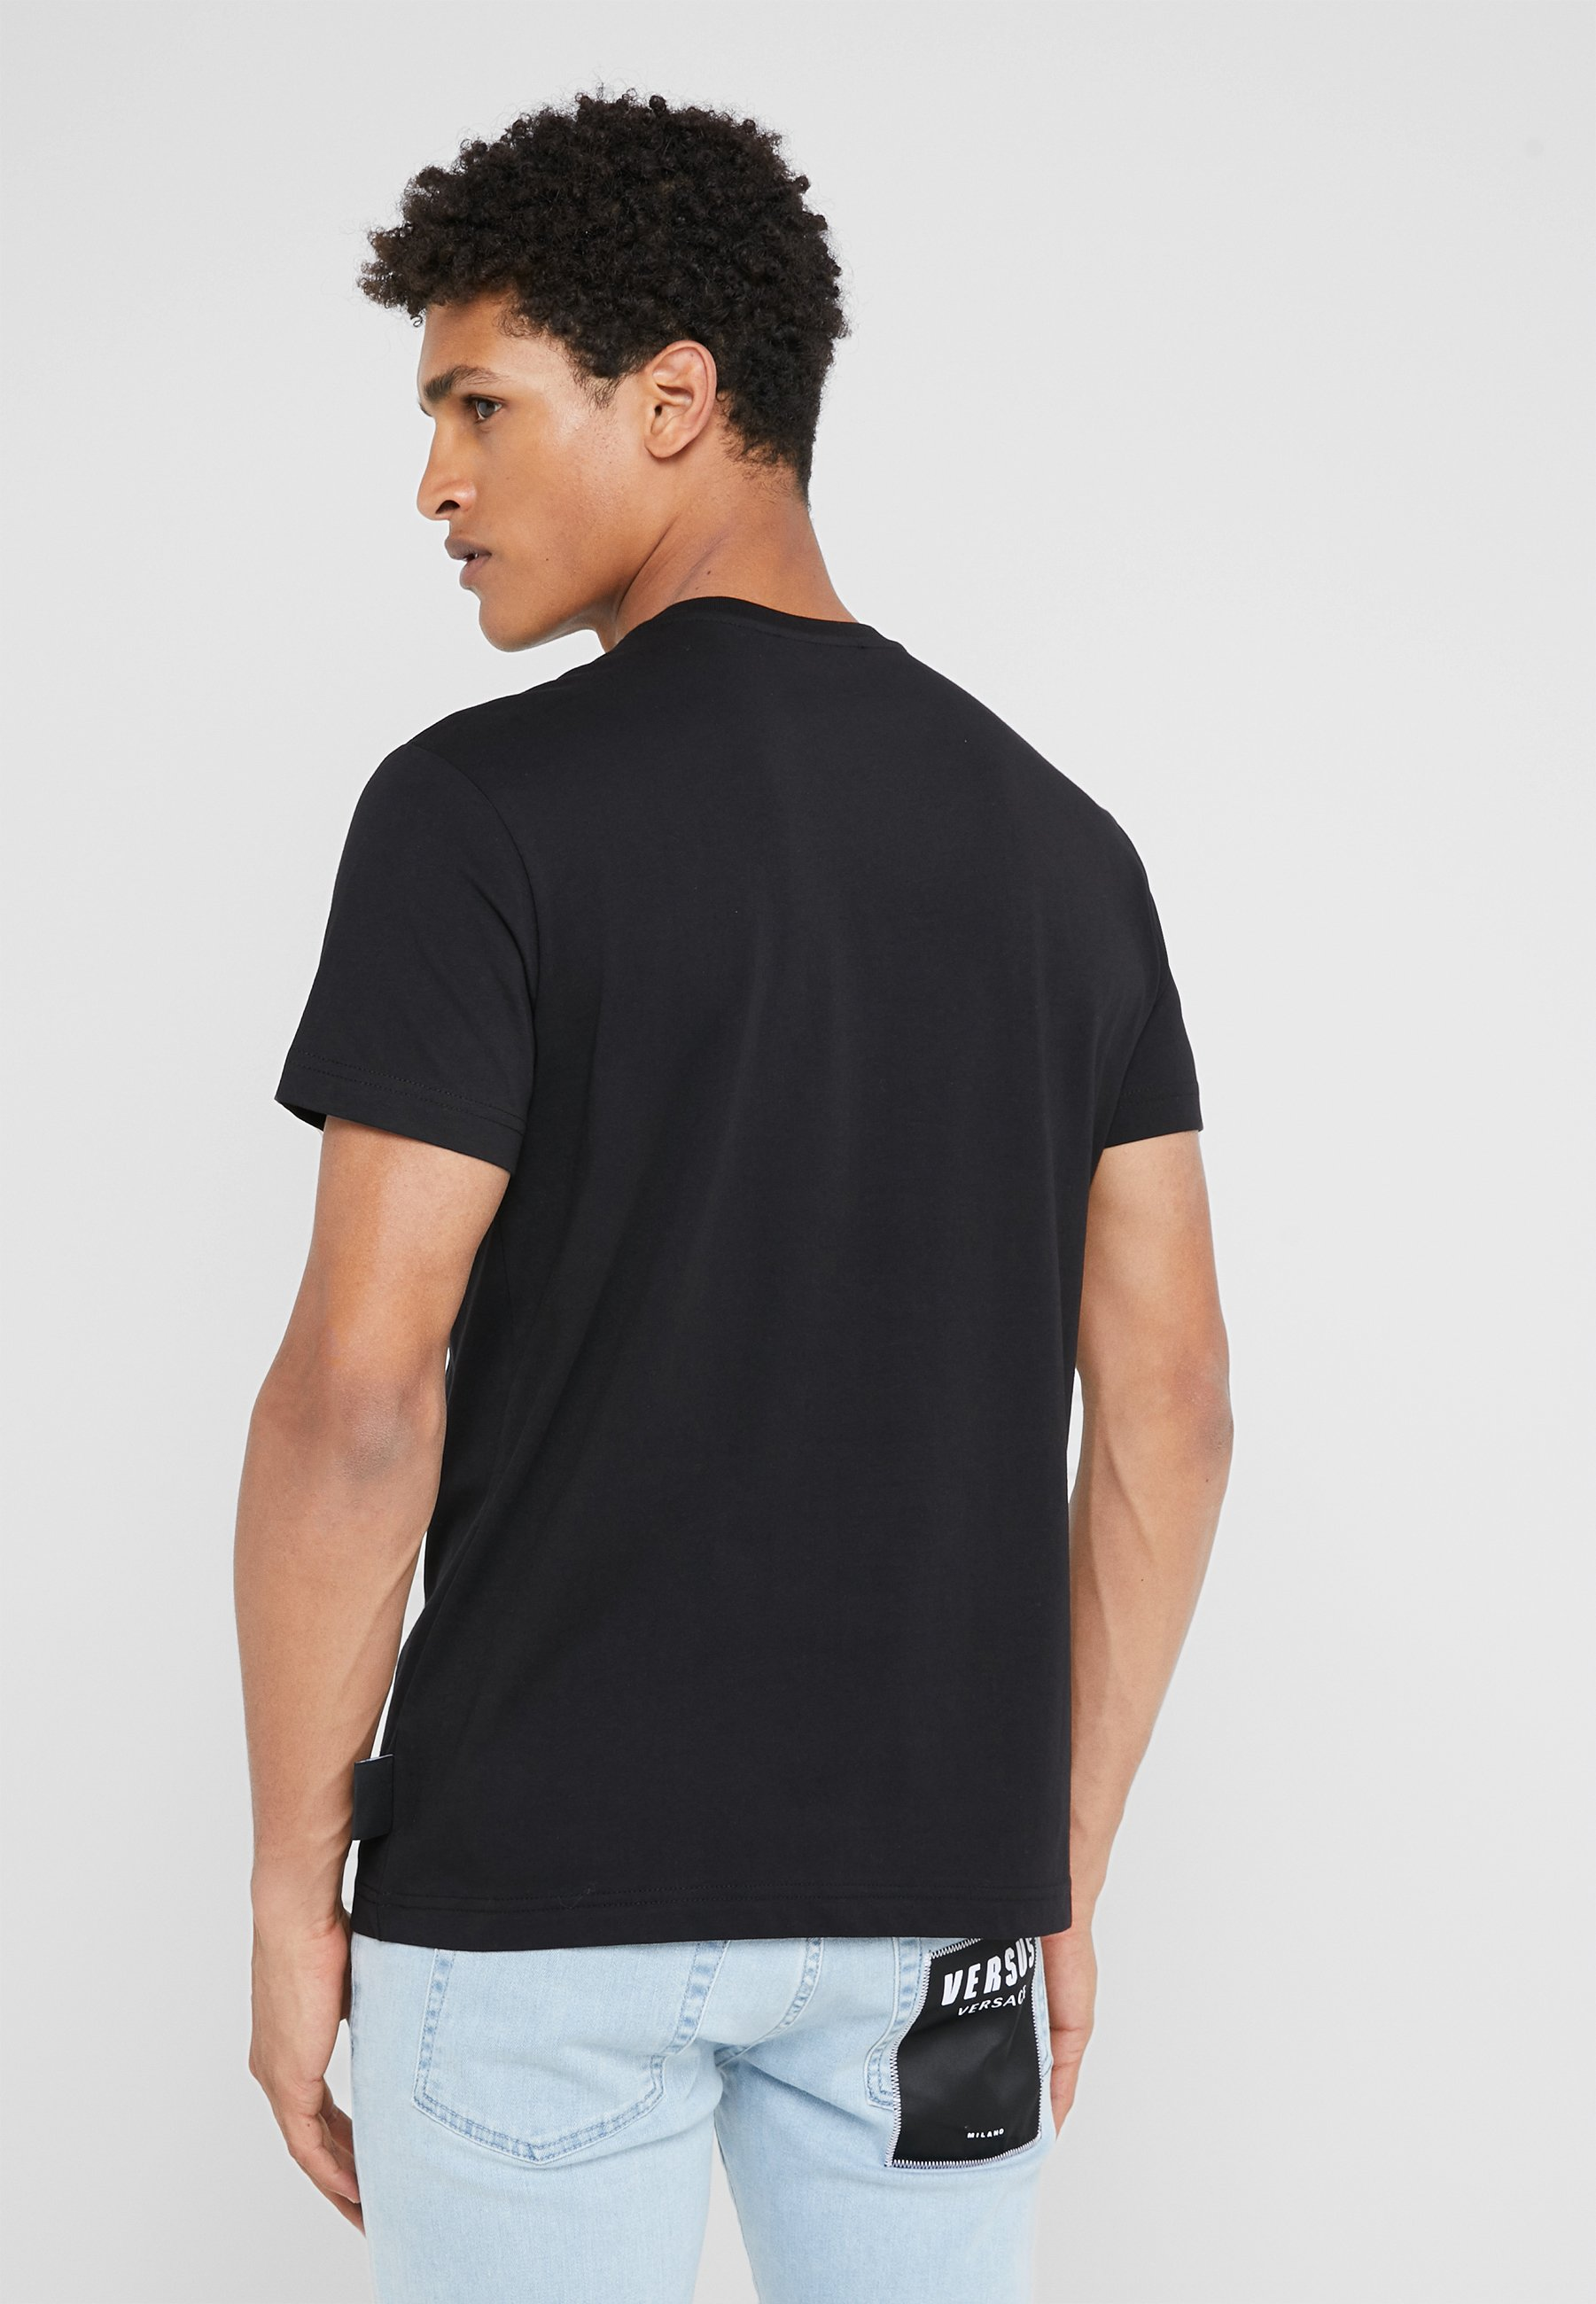 MaglietteT Versace shirt Black Jeans Couture Con Stampa OTiPlwkXuZ